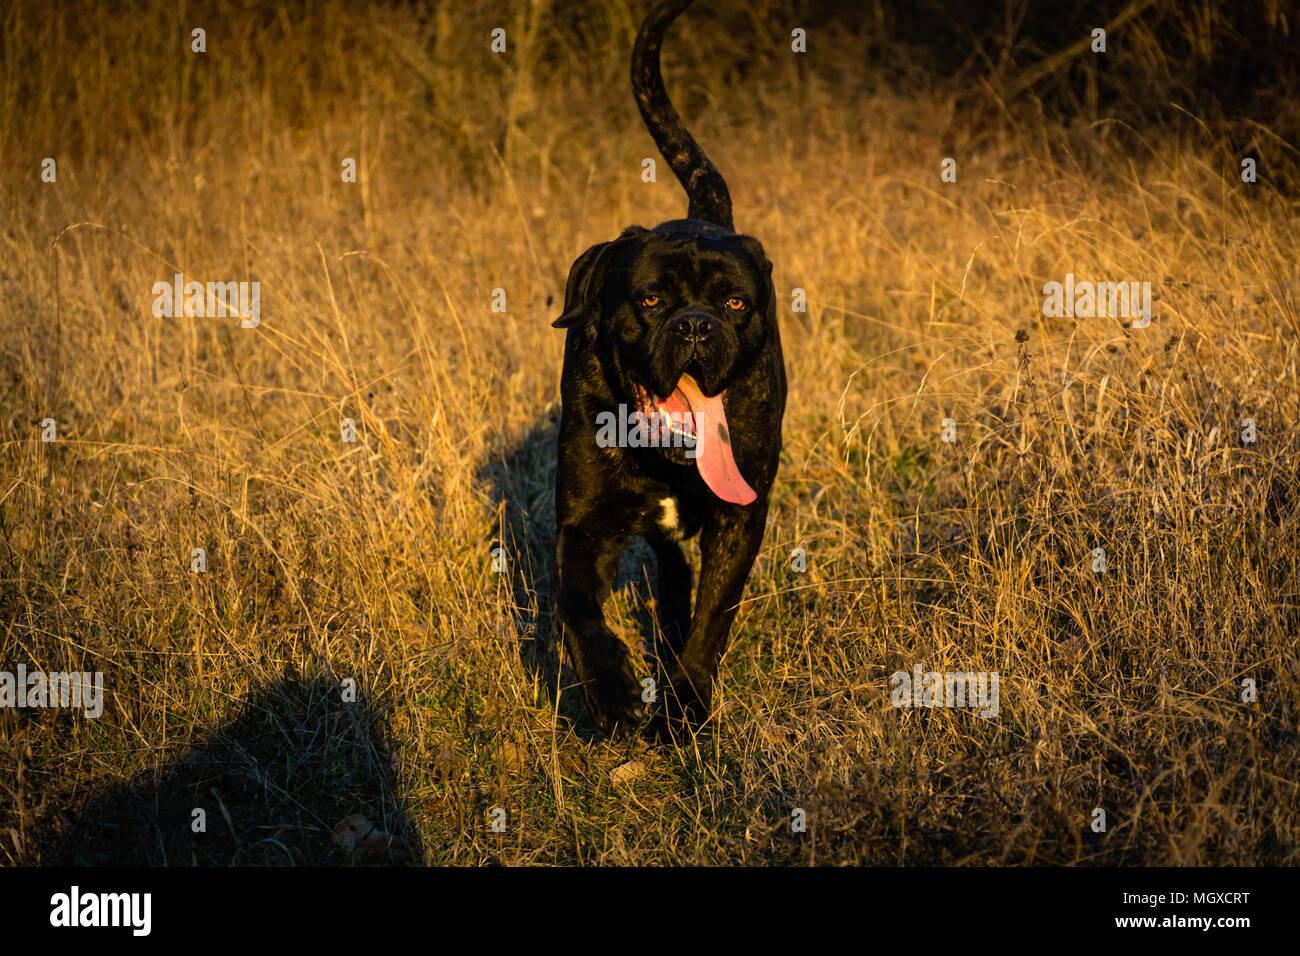 Big Black Dog Cane Corso Italian Mastiff Walking In A Field With